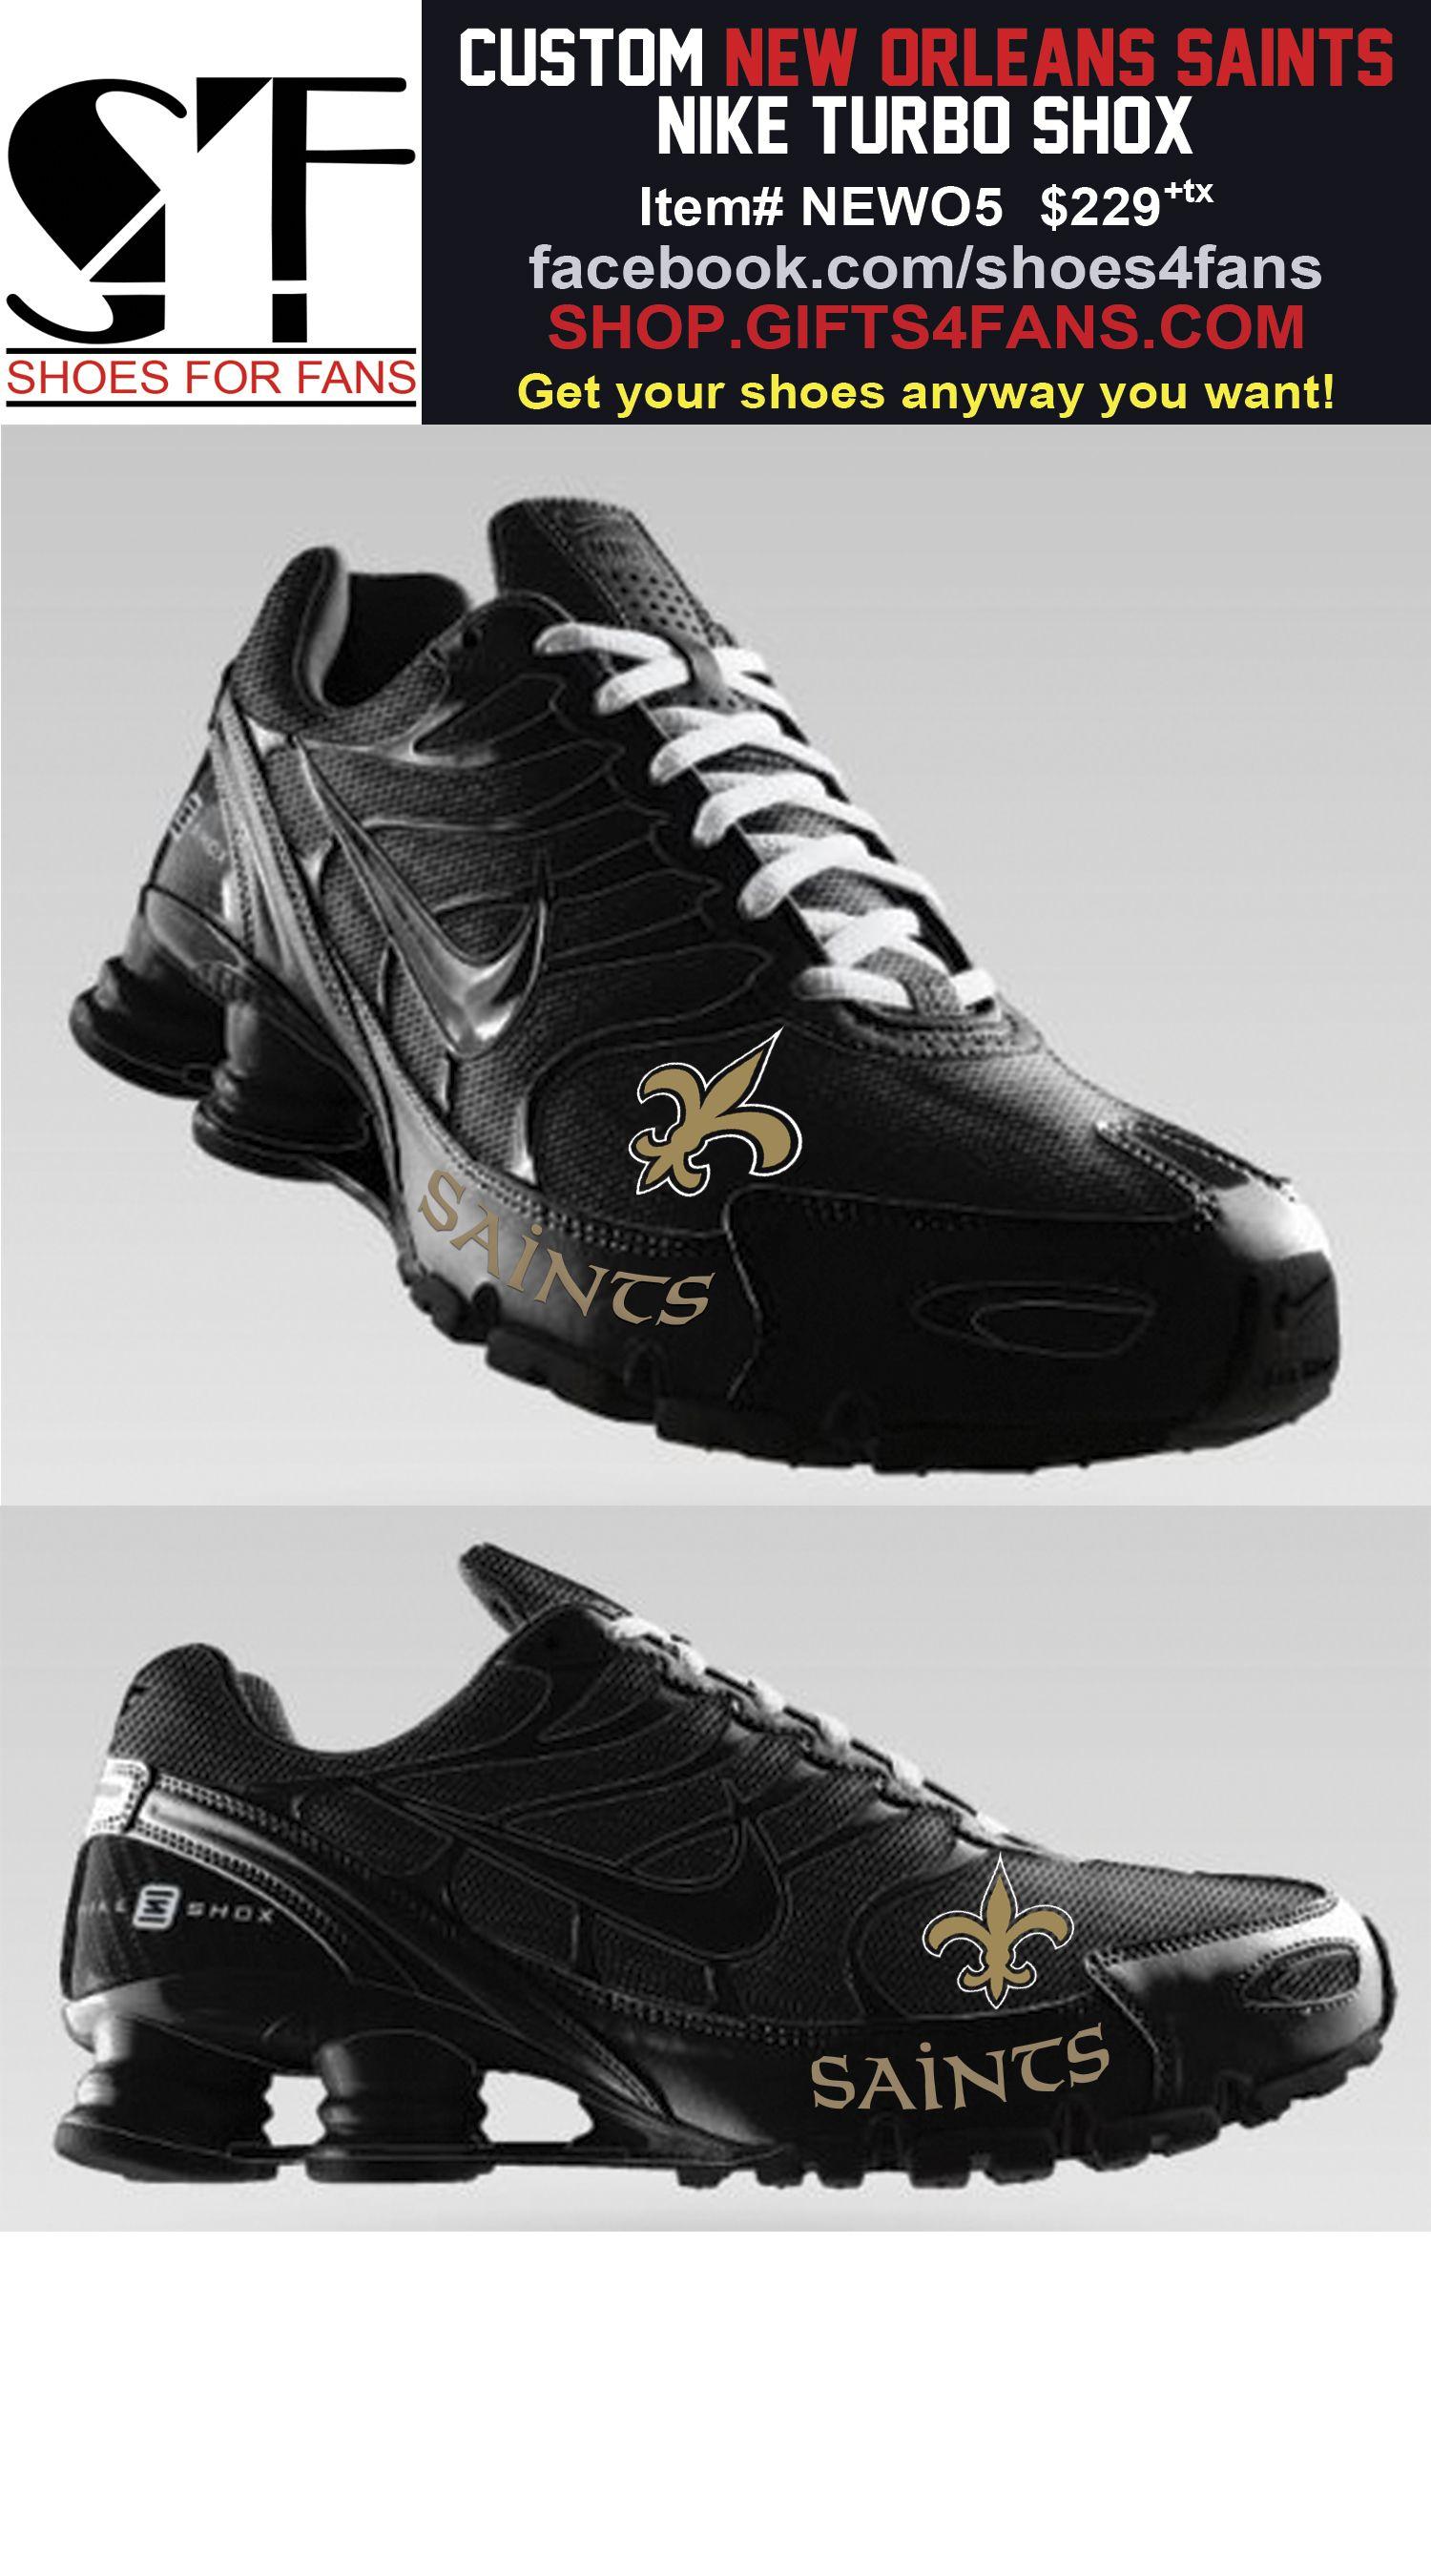 Nfl shoes, Sneakers nike air